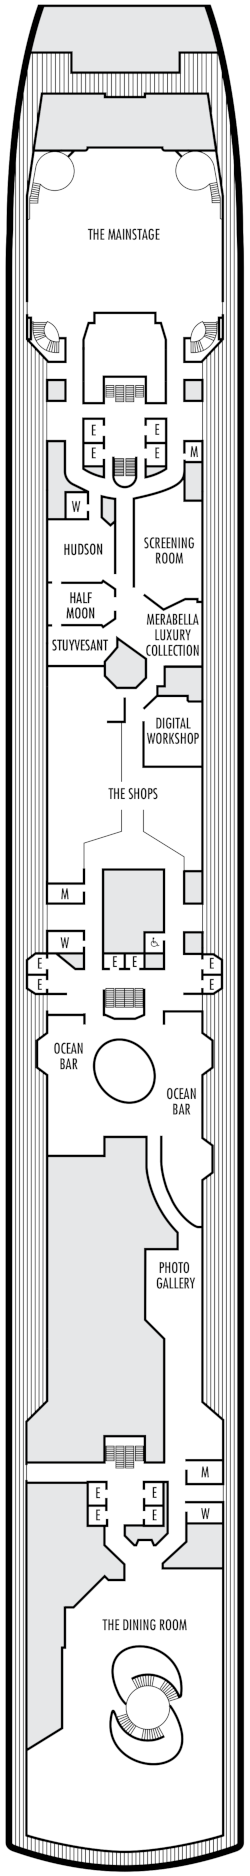 Zuiderdam Promenade Deck Deck Plan